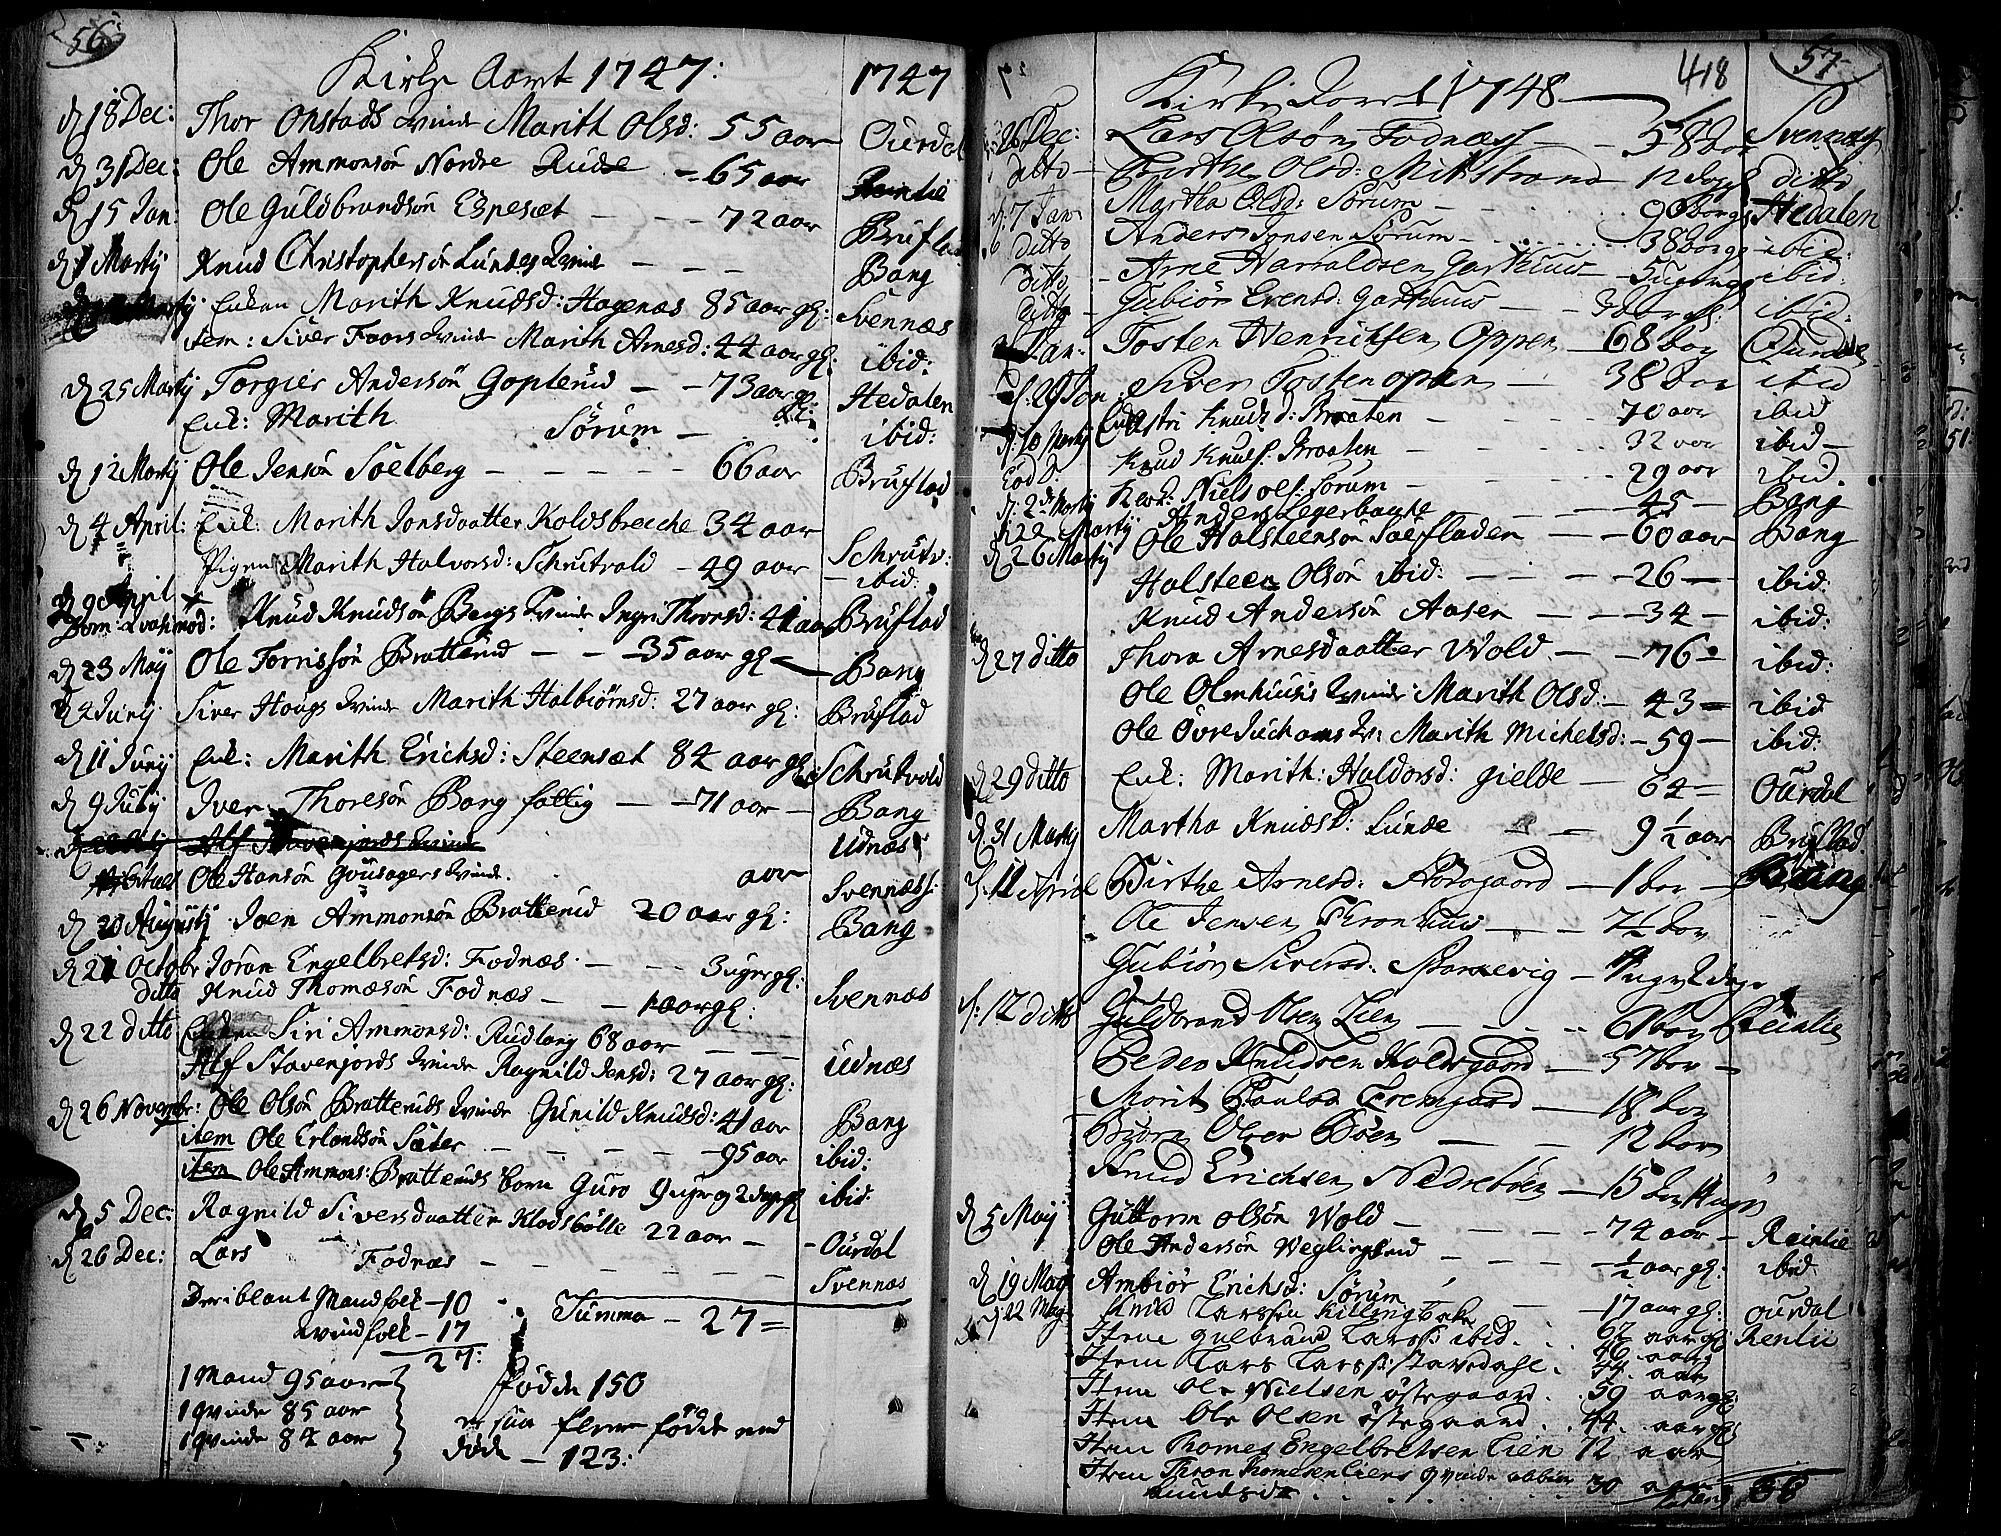 SAH, Aurdal prestekontor, Ministerialbok nr. 4, 1730-1762, s. 56-57